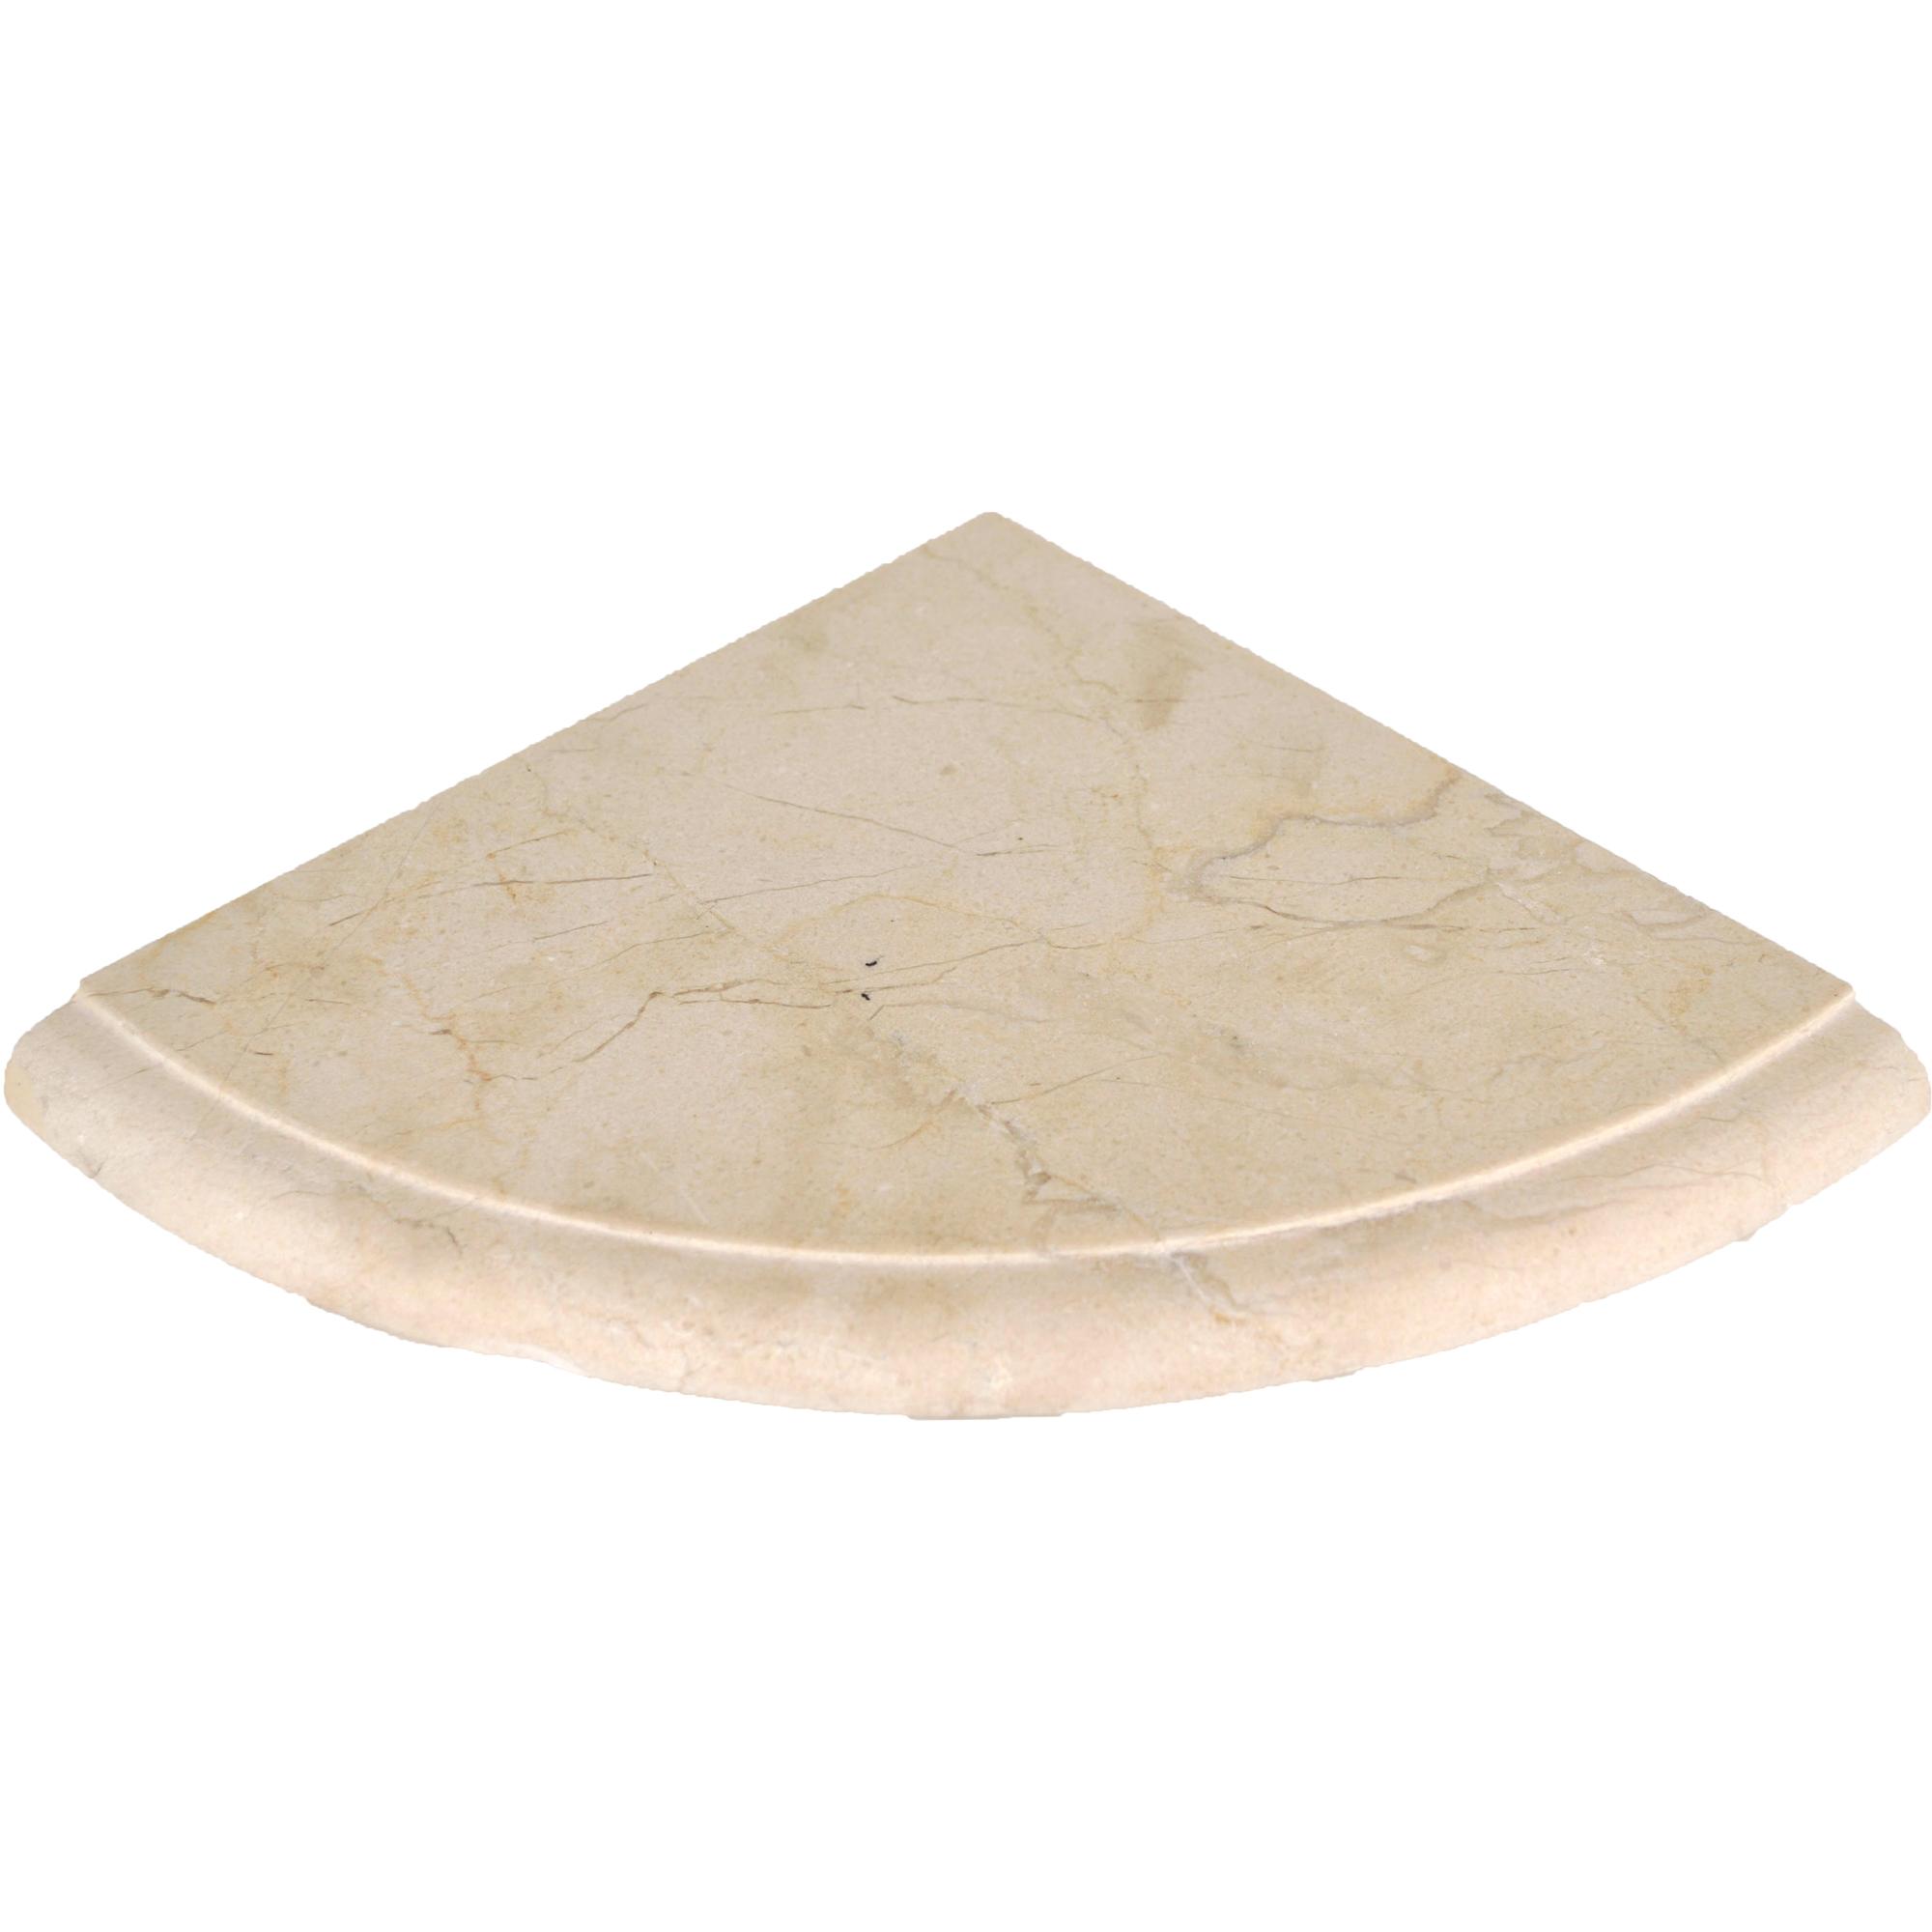 Shower shelves crema marfil honed 8 x 8 honed bella casa for Bella casa tiles